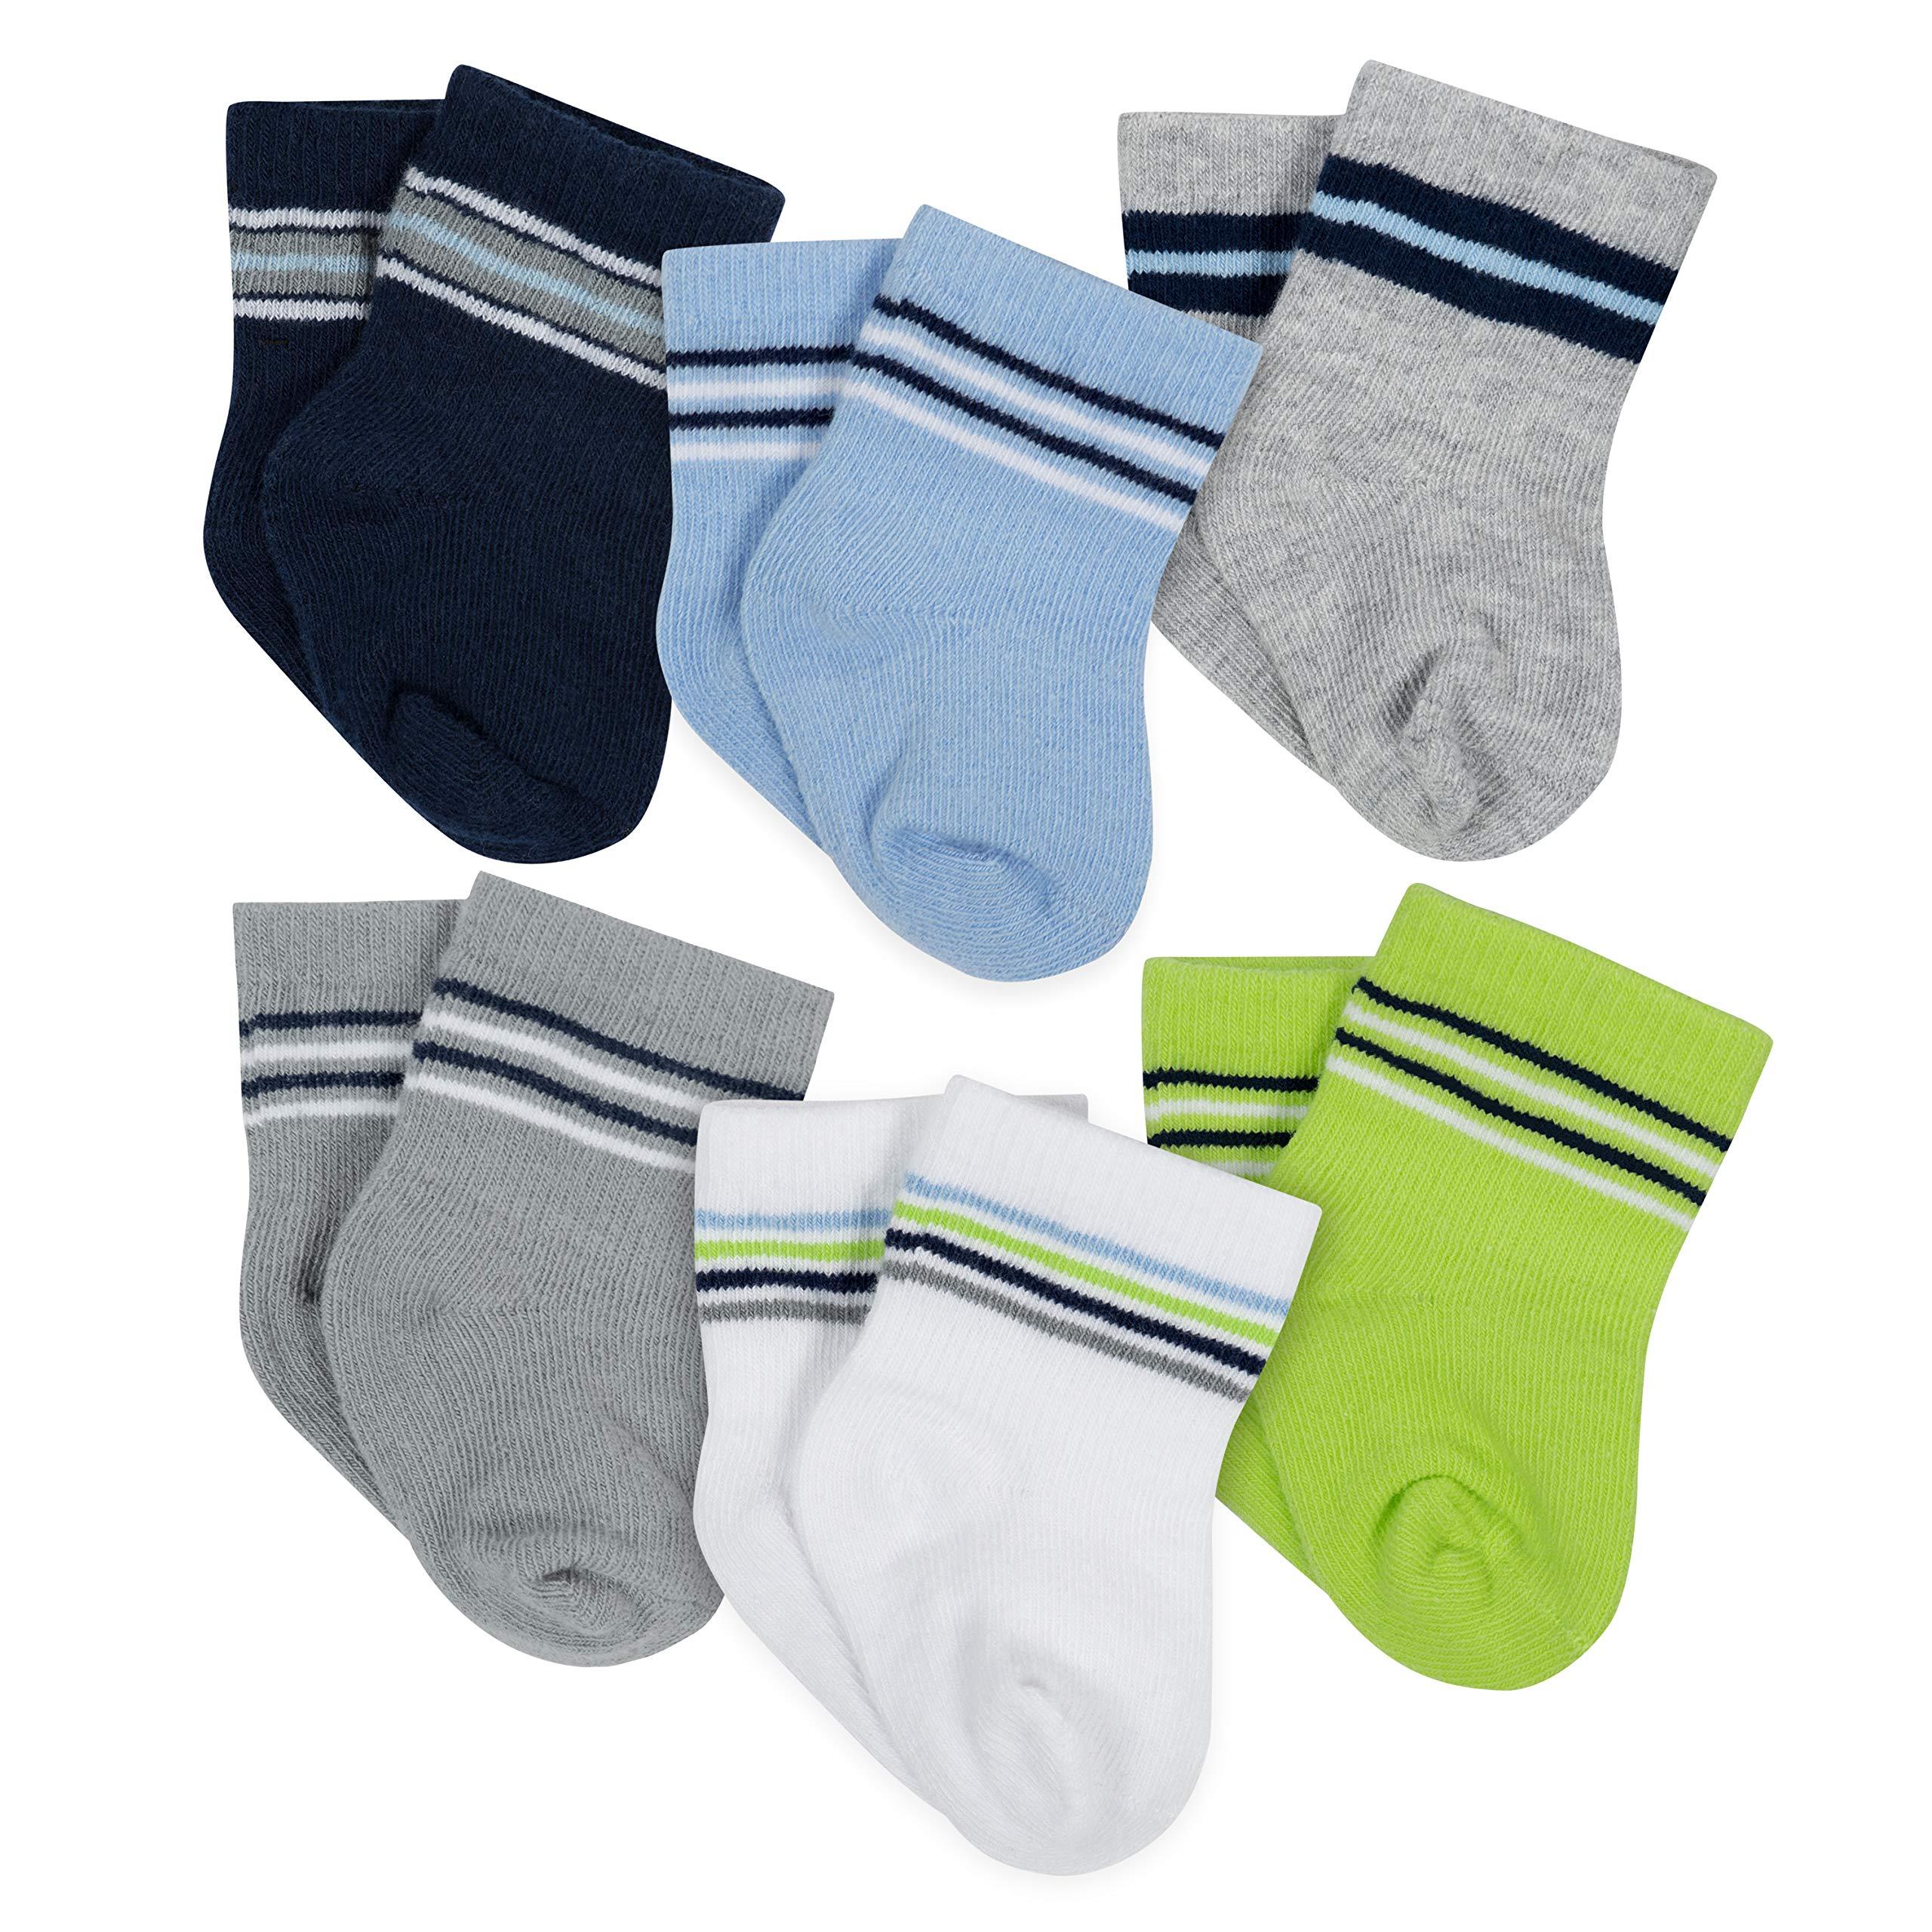 Gerber Baby Unisex 6 Pack Socks, Stripes, 3-6 Months